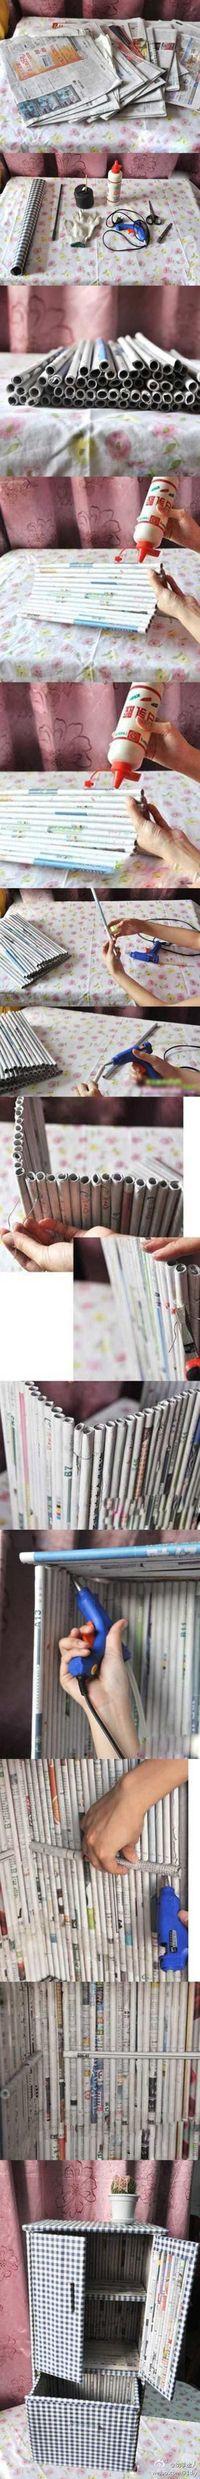 newspaper diy project Flor. mueble p equipo.